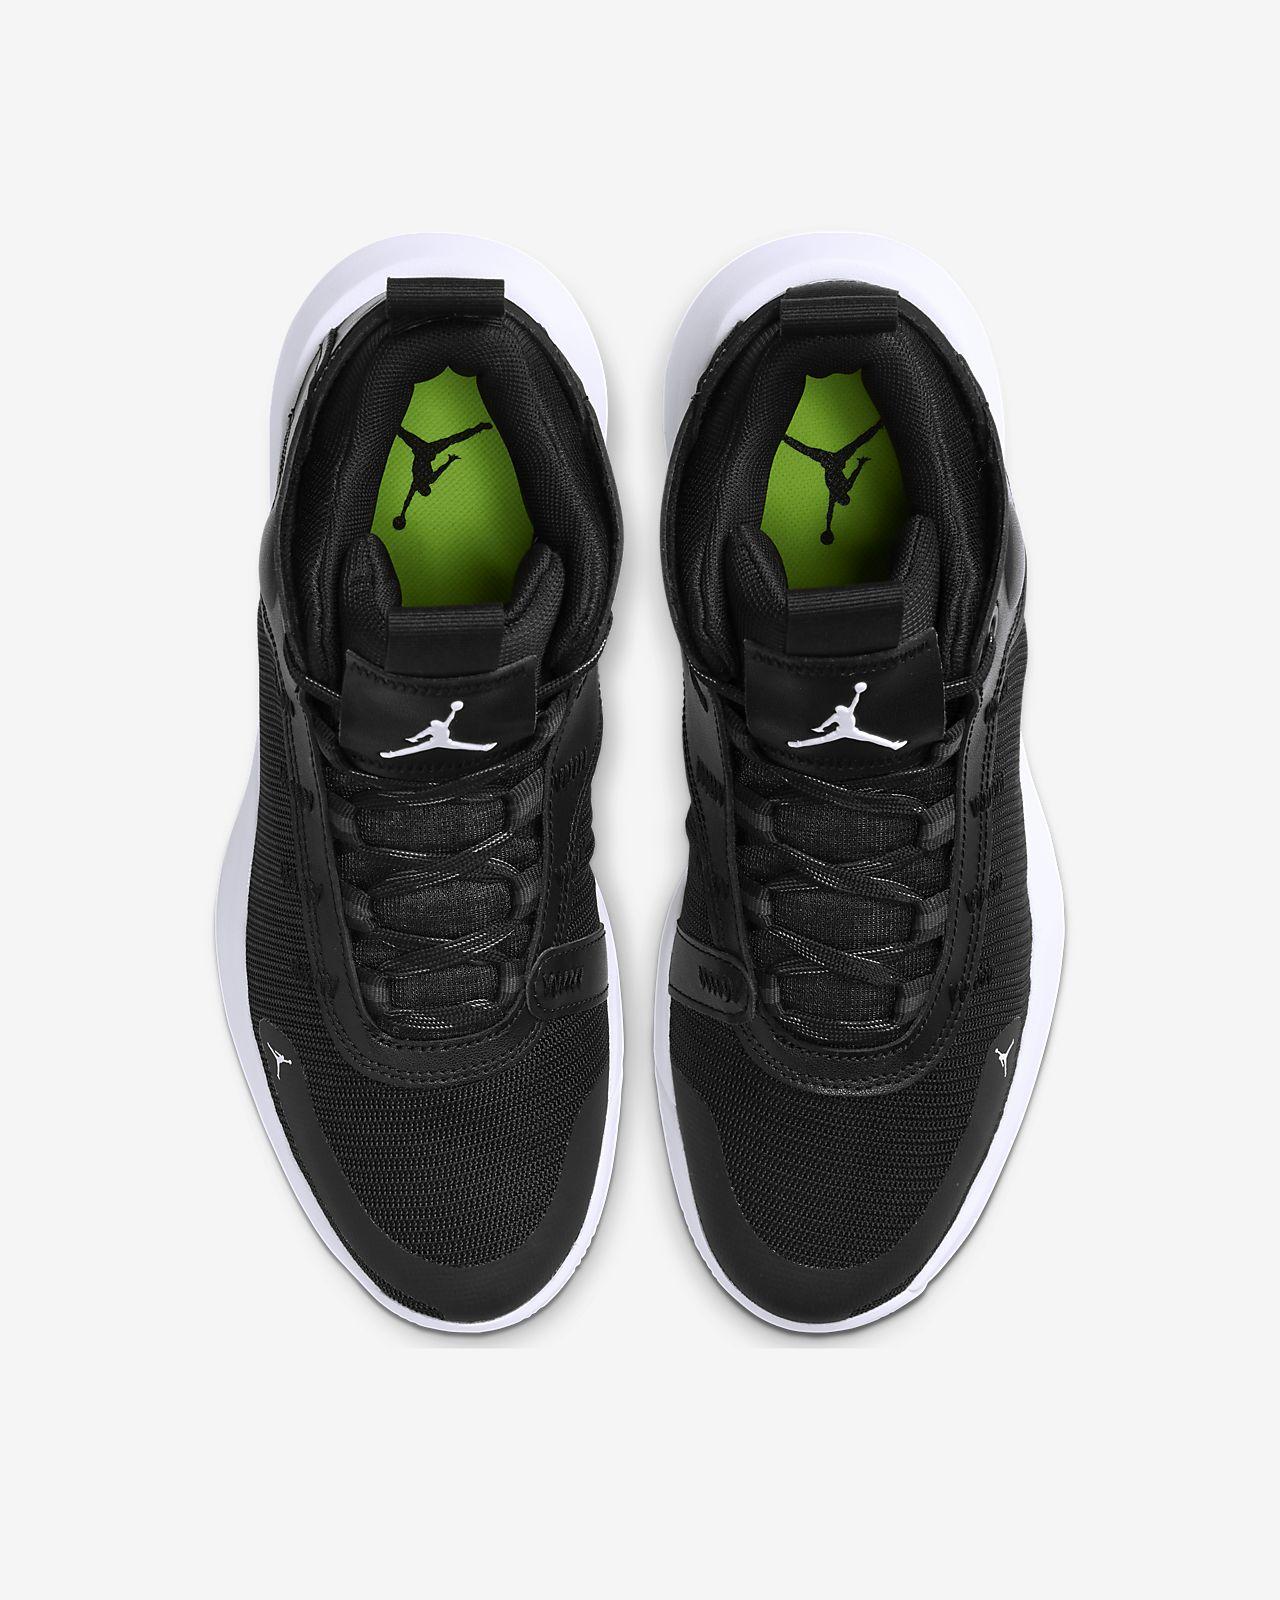 jordan nike free run günstig, Air Jordan 7 Herren Basketball